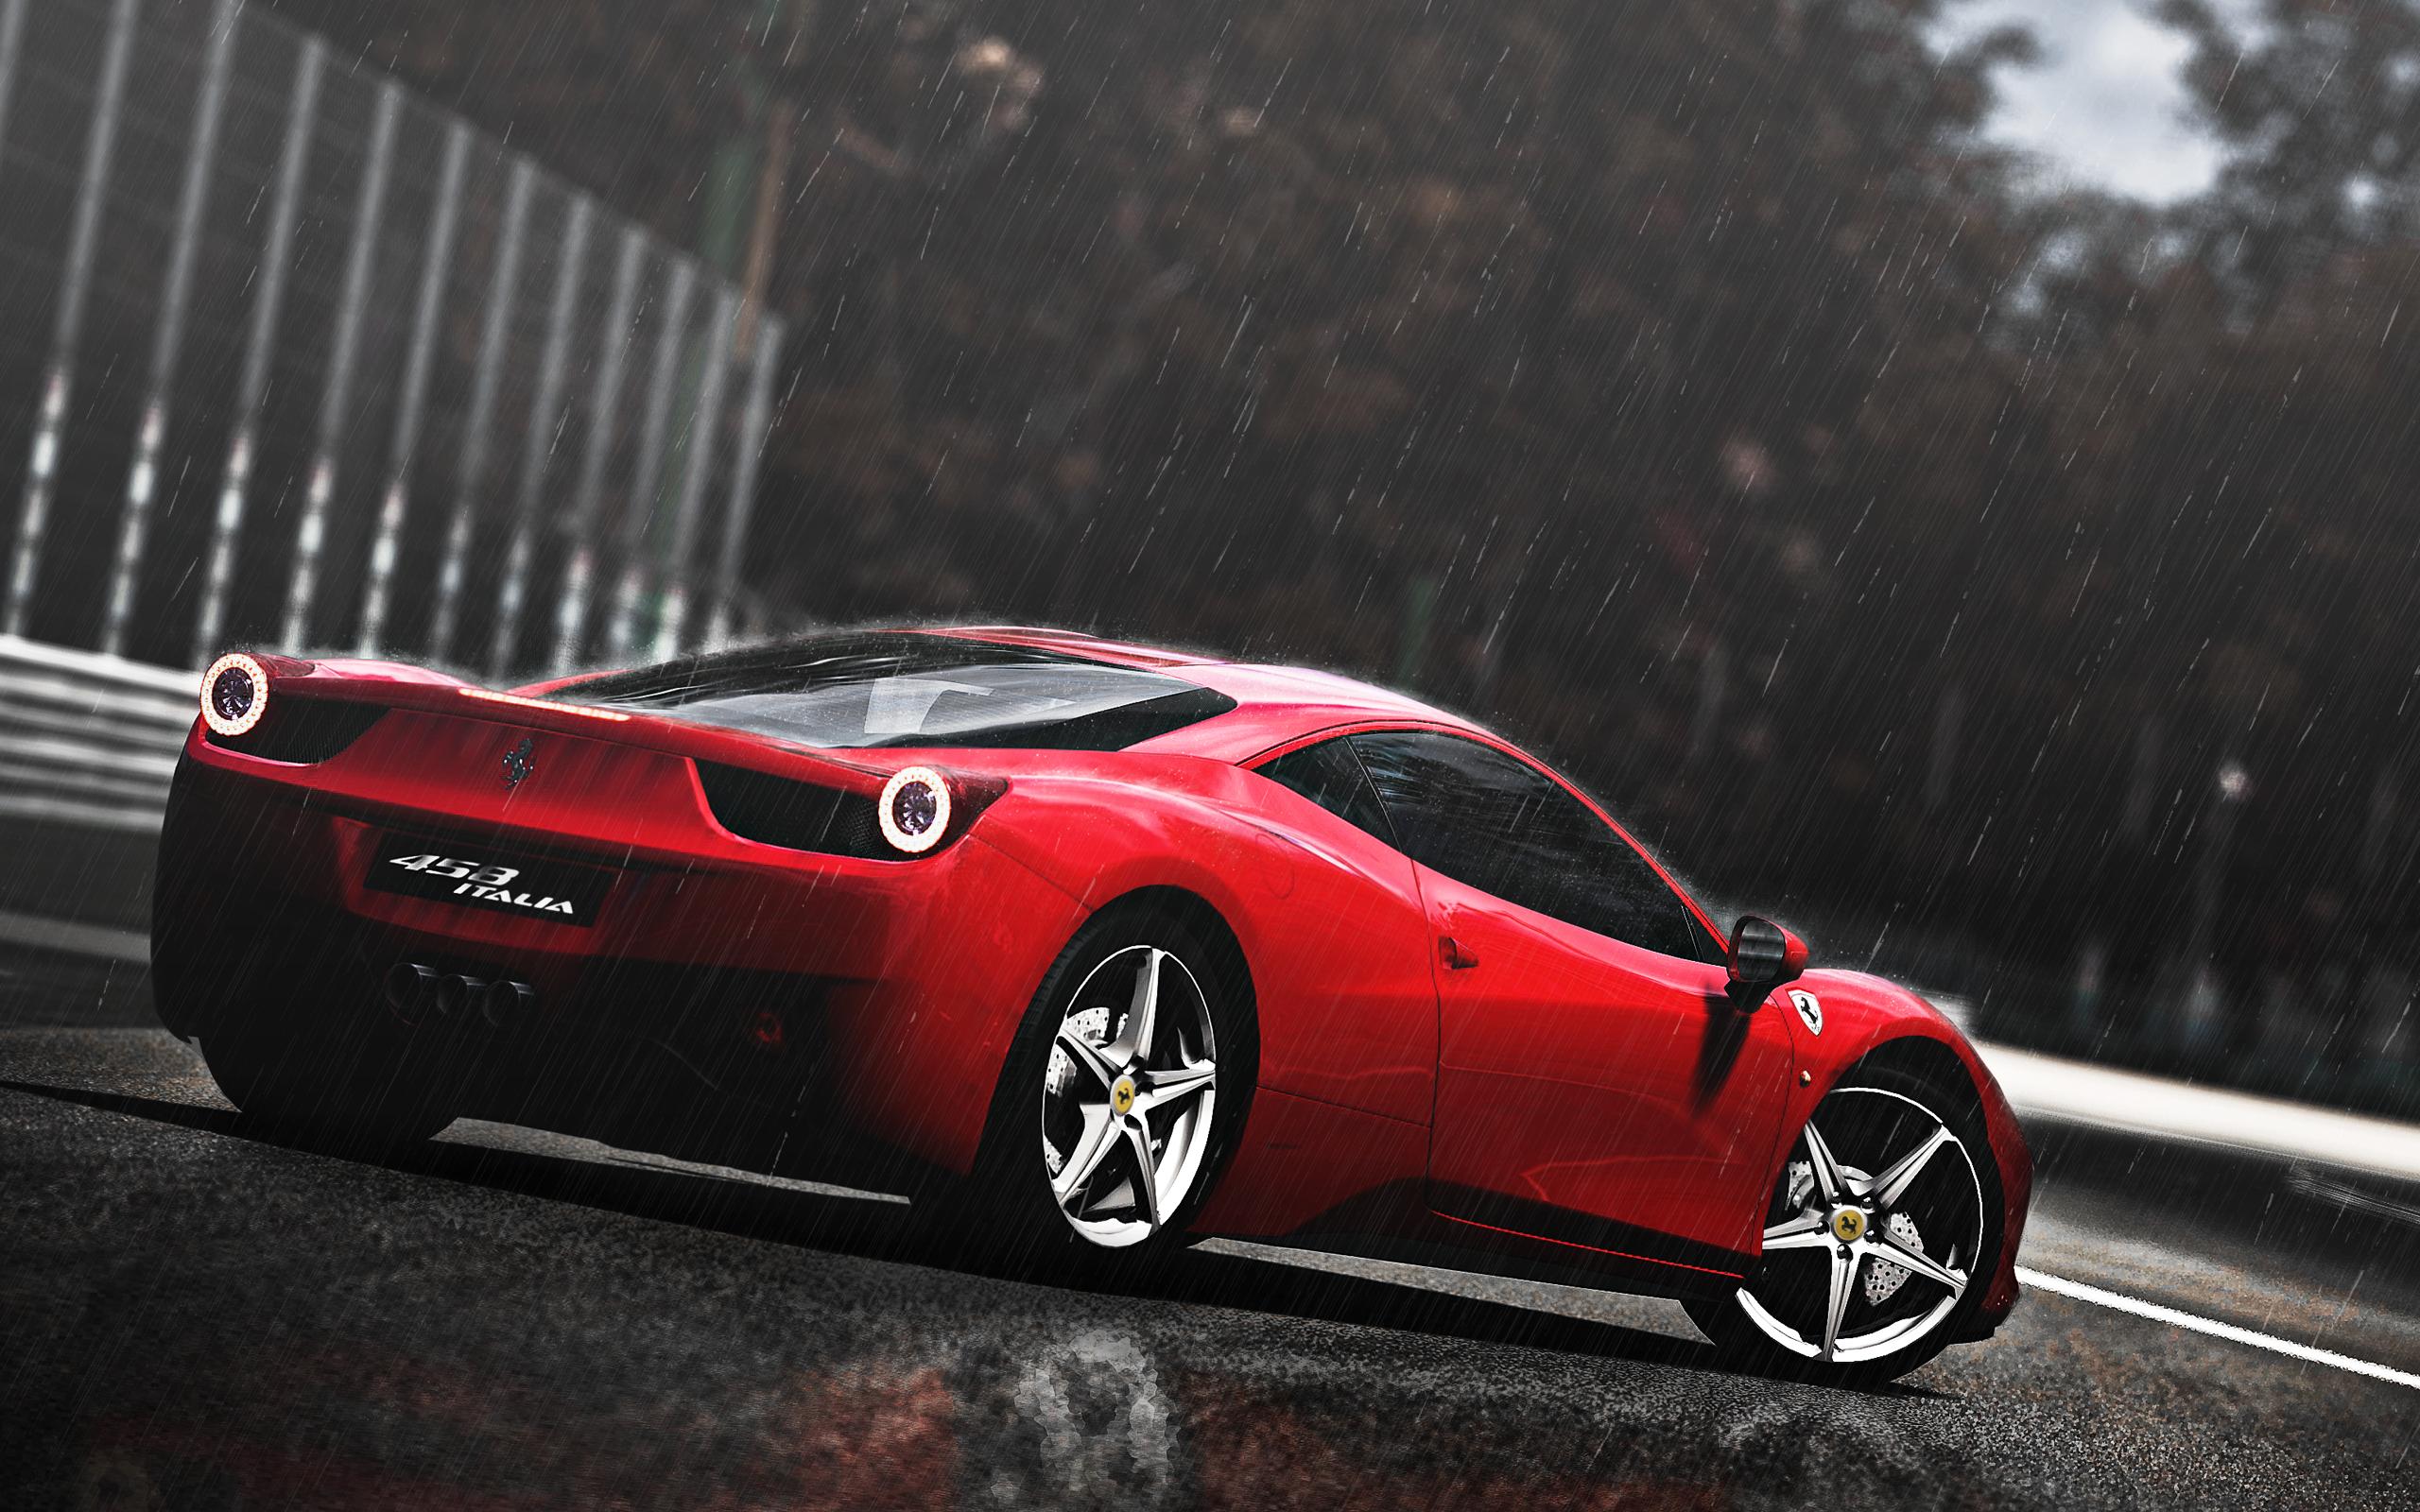 2560x1600 Ferrari 458 Italia in the Rain desktop PC and Mac wallpaper 2560x1600